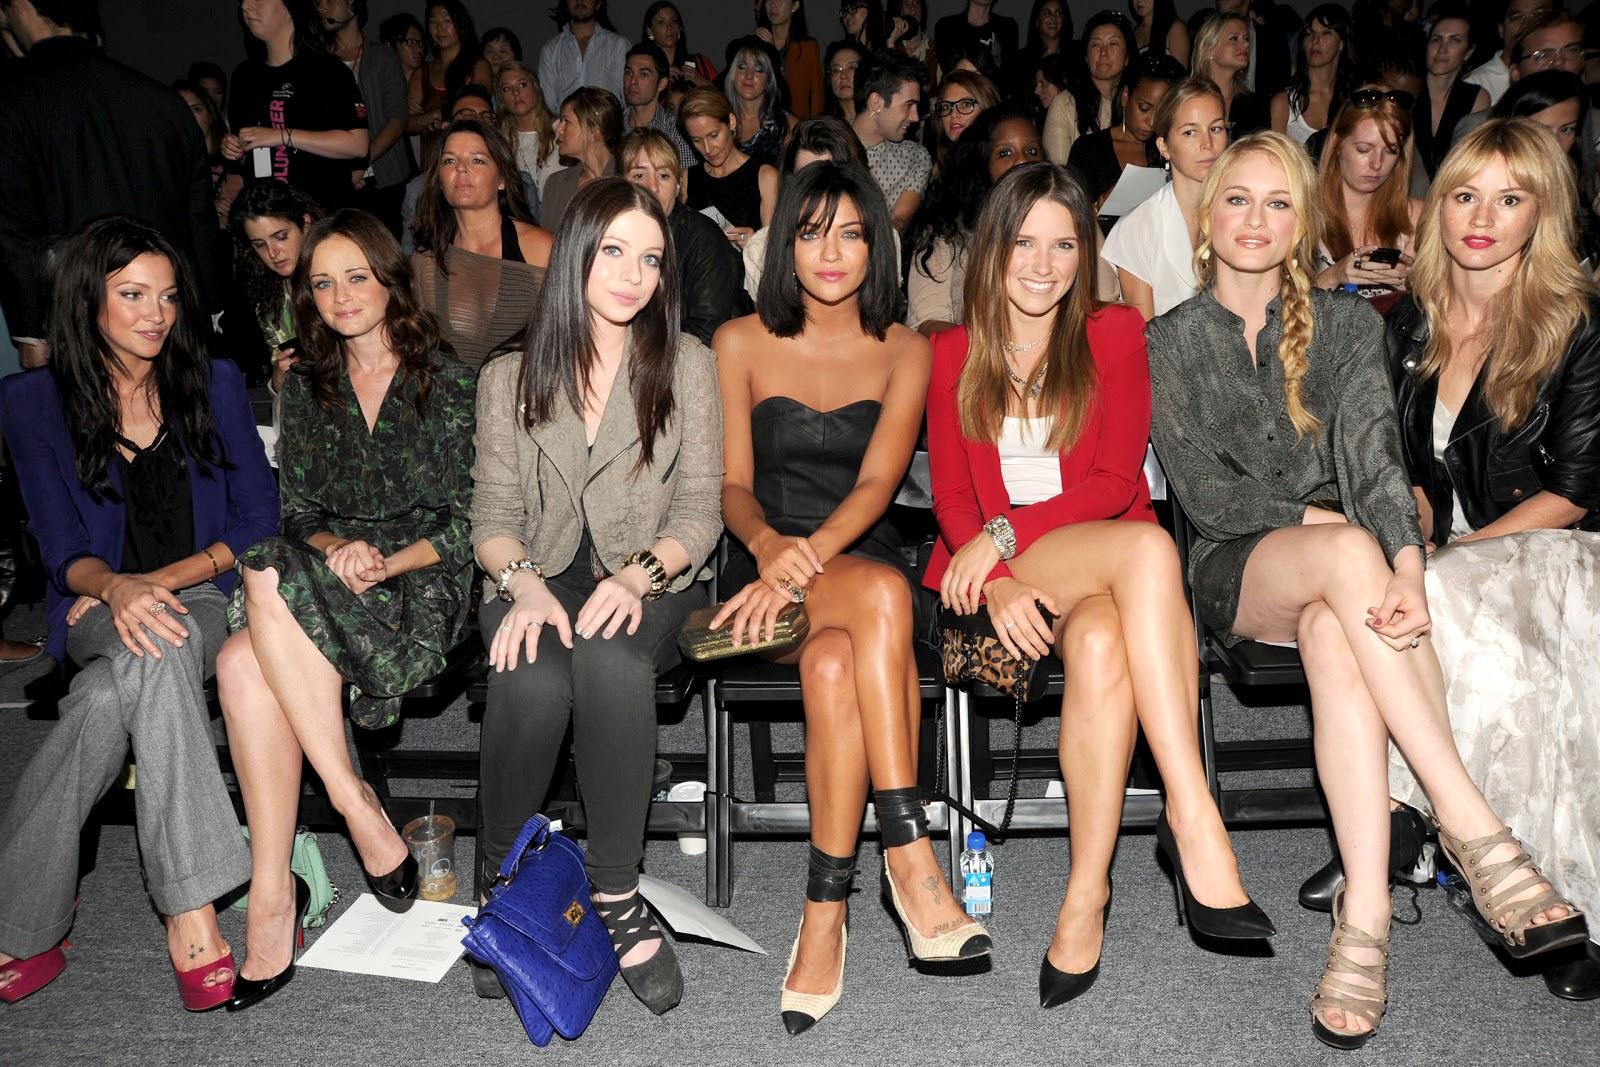 http://1.bp.blogspot.com/-rh2cptRSySM/TnavklDFBgI/AAAAAAAAGWM/Tre8CT7XmOo/s1600/Katie+Cassidy%252C+Alexis+Bledel%252C+Michelle+Trachtenberg%252C+Jessica+Szohr%252C+Sophia+Bush%252C+Leven+Rambin.jpg